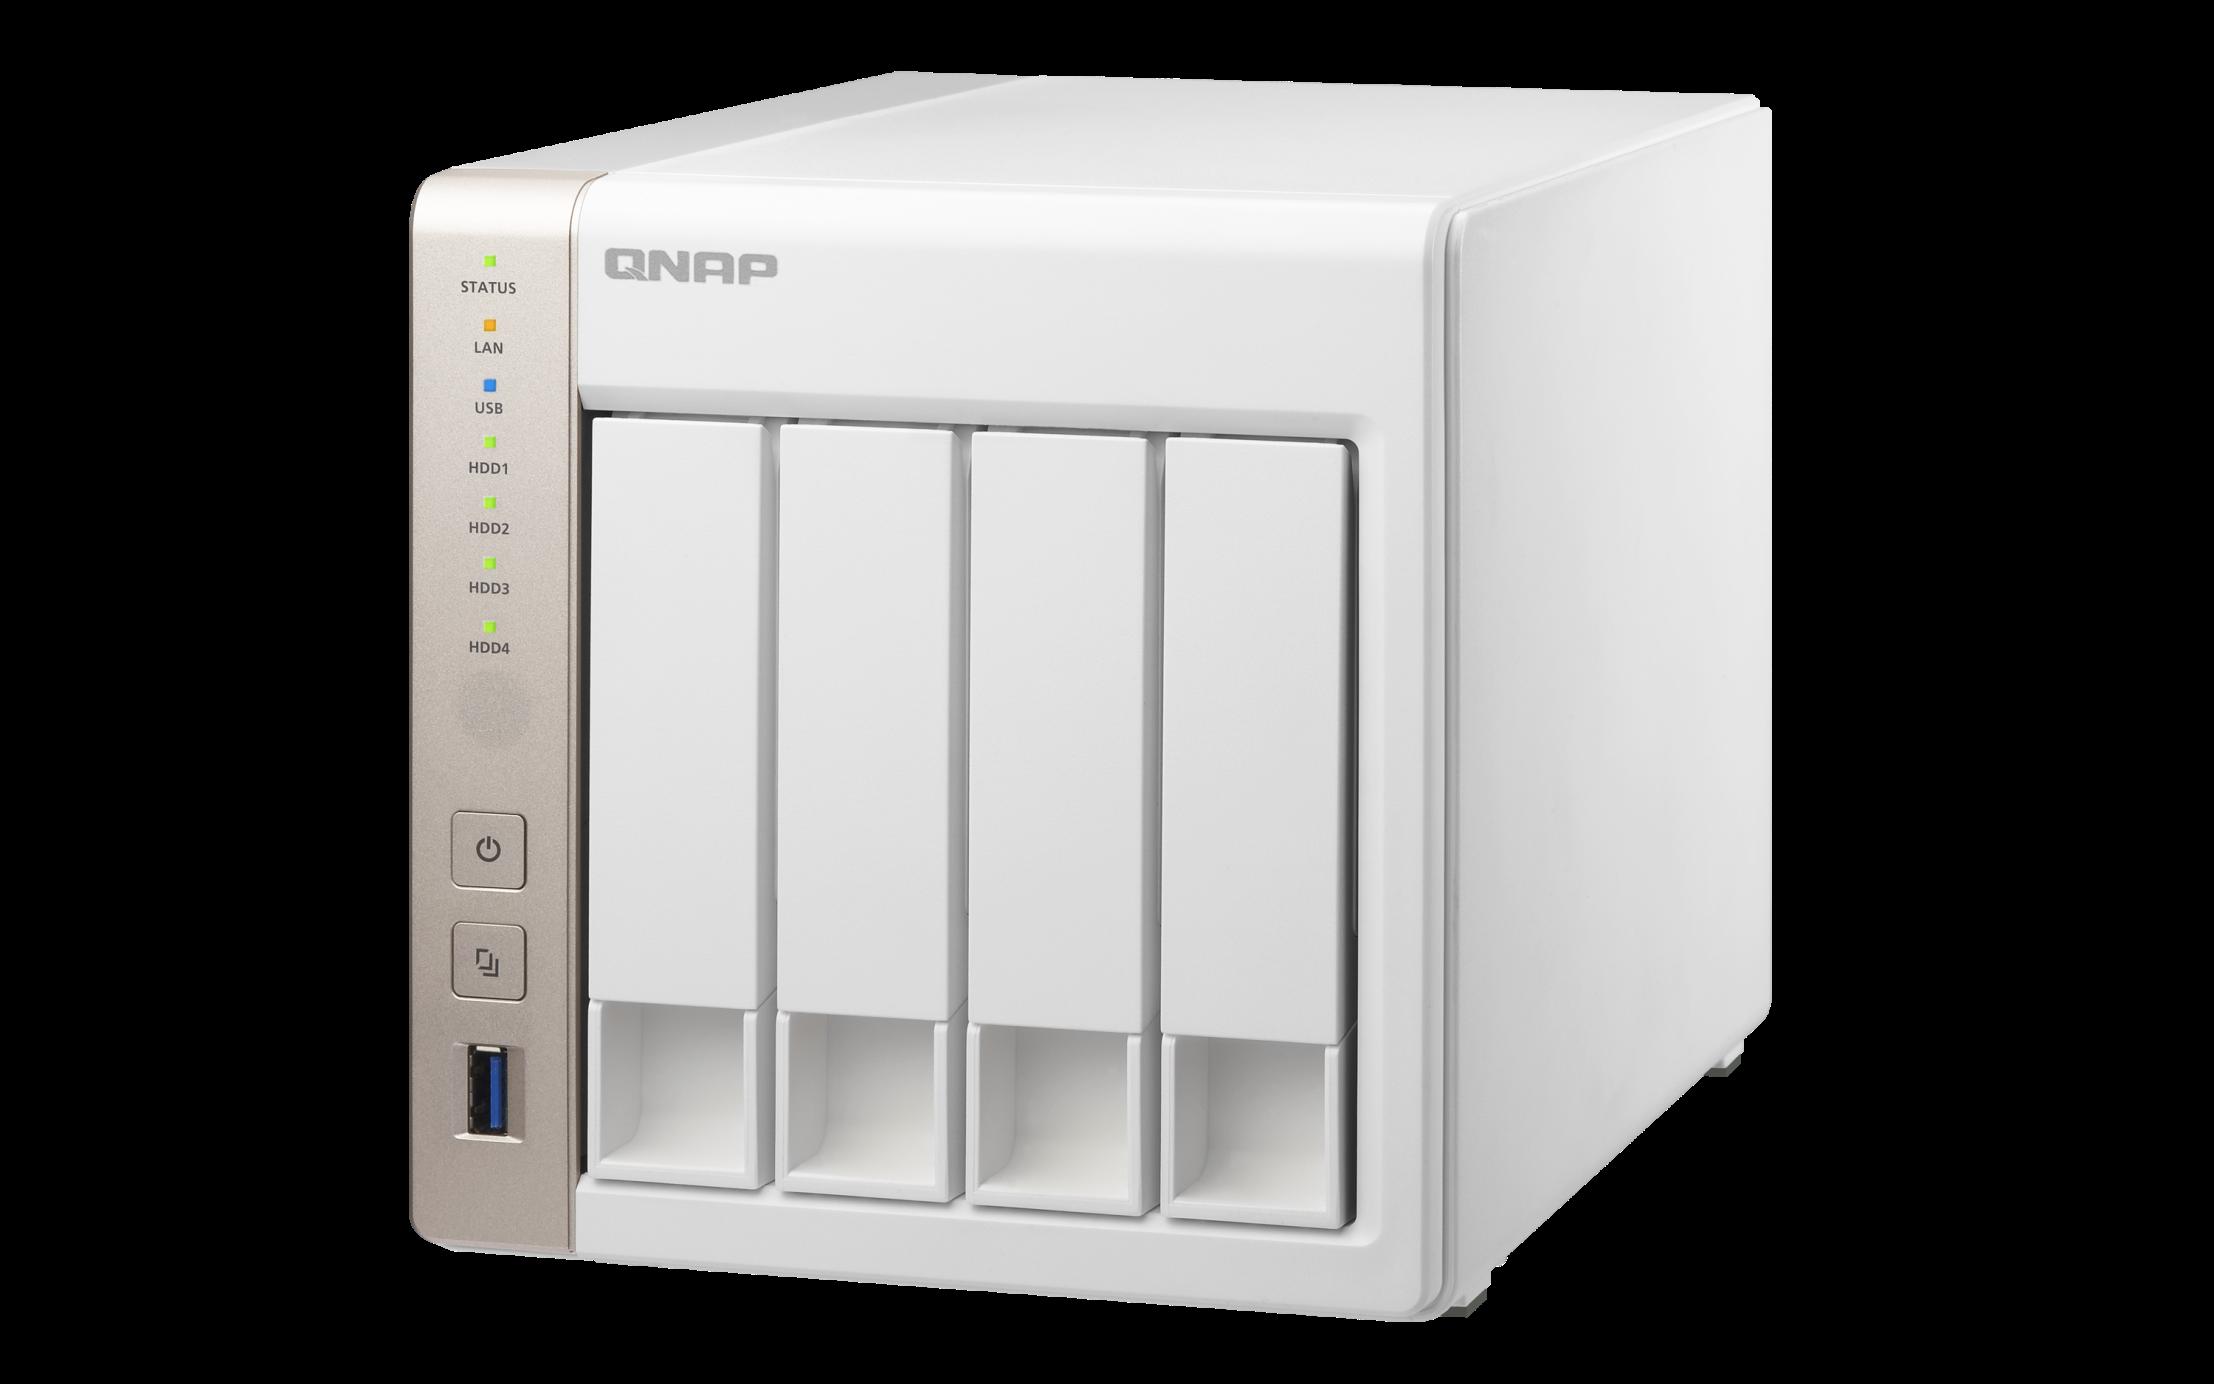 QNAP TS-451 TWR 4x 2.5/3.5 SATA Celeron 2.41 DC 1GB DDR3L 2xGlan